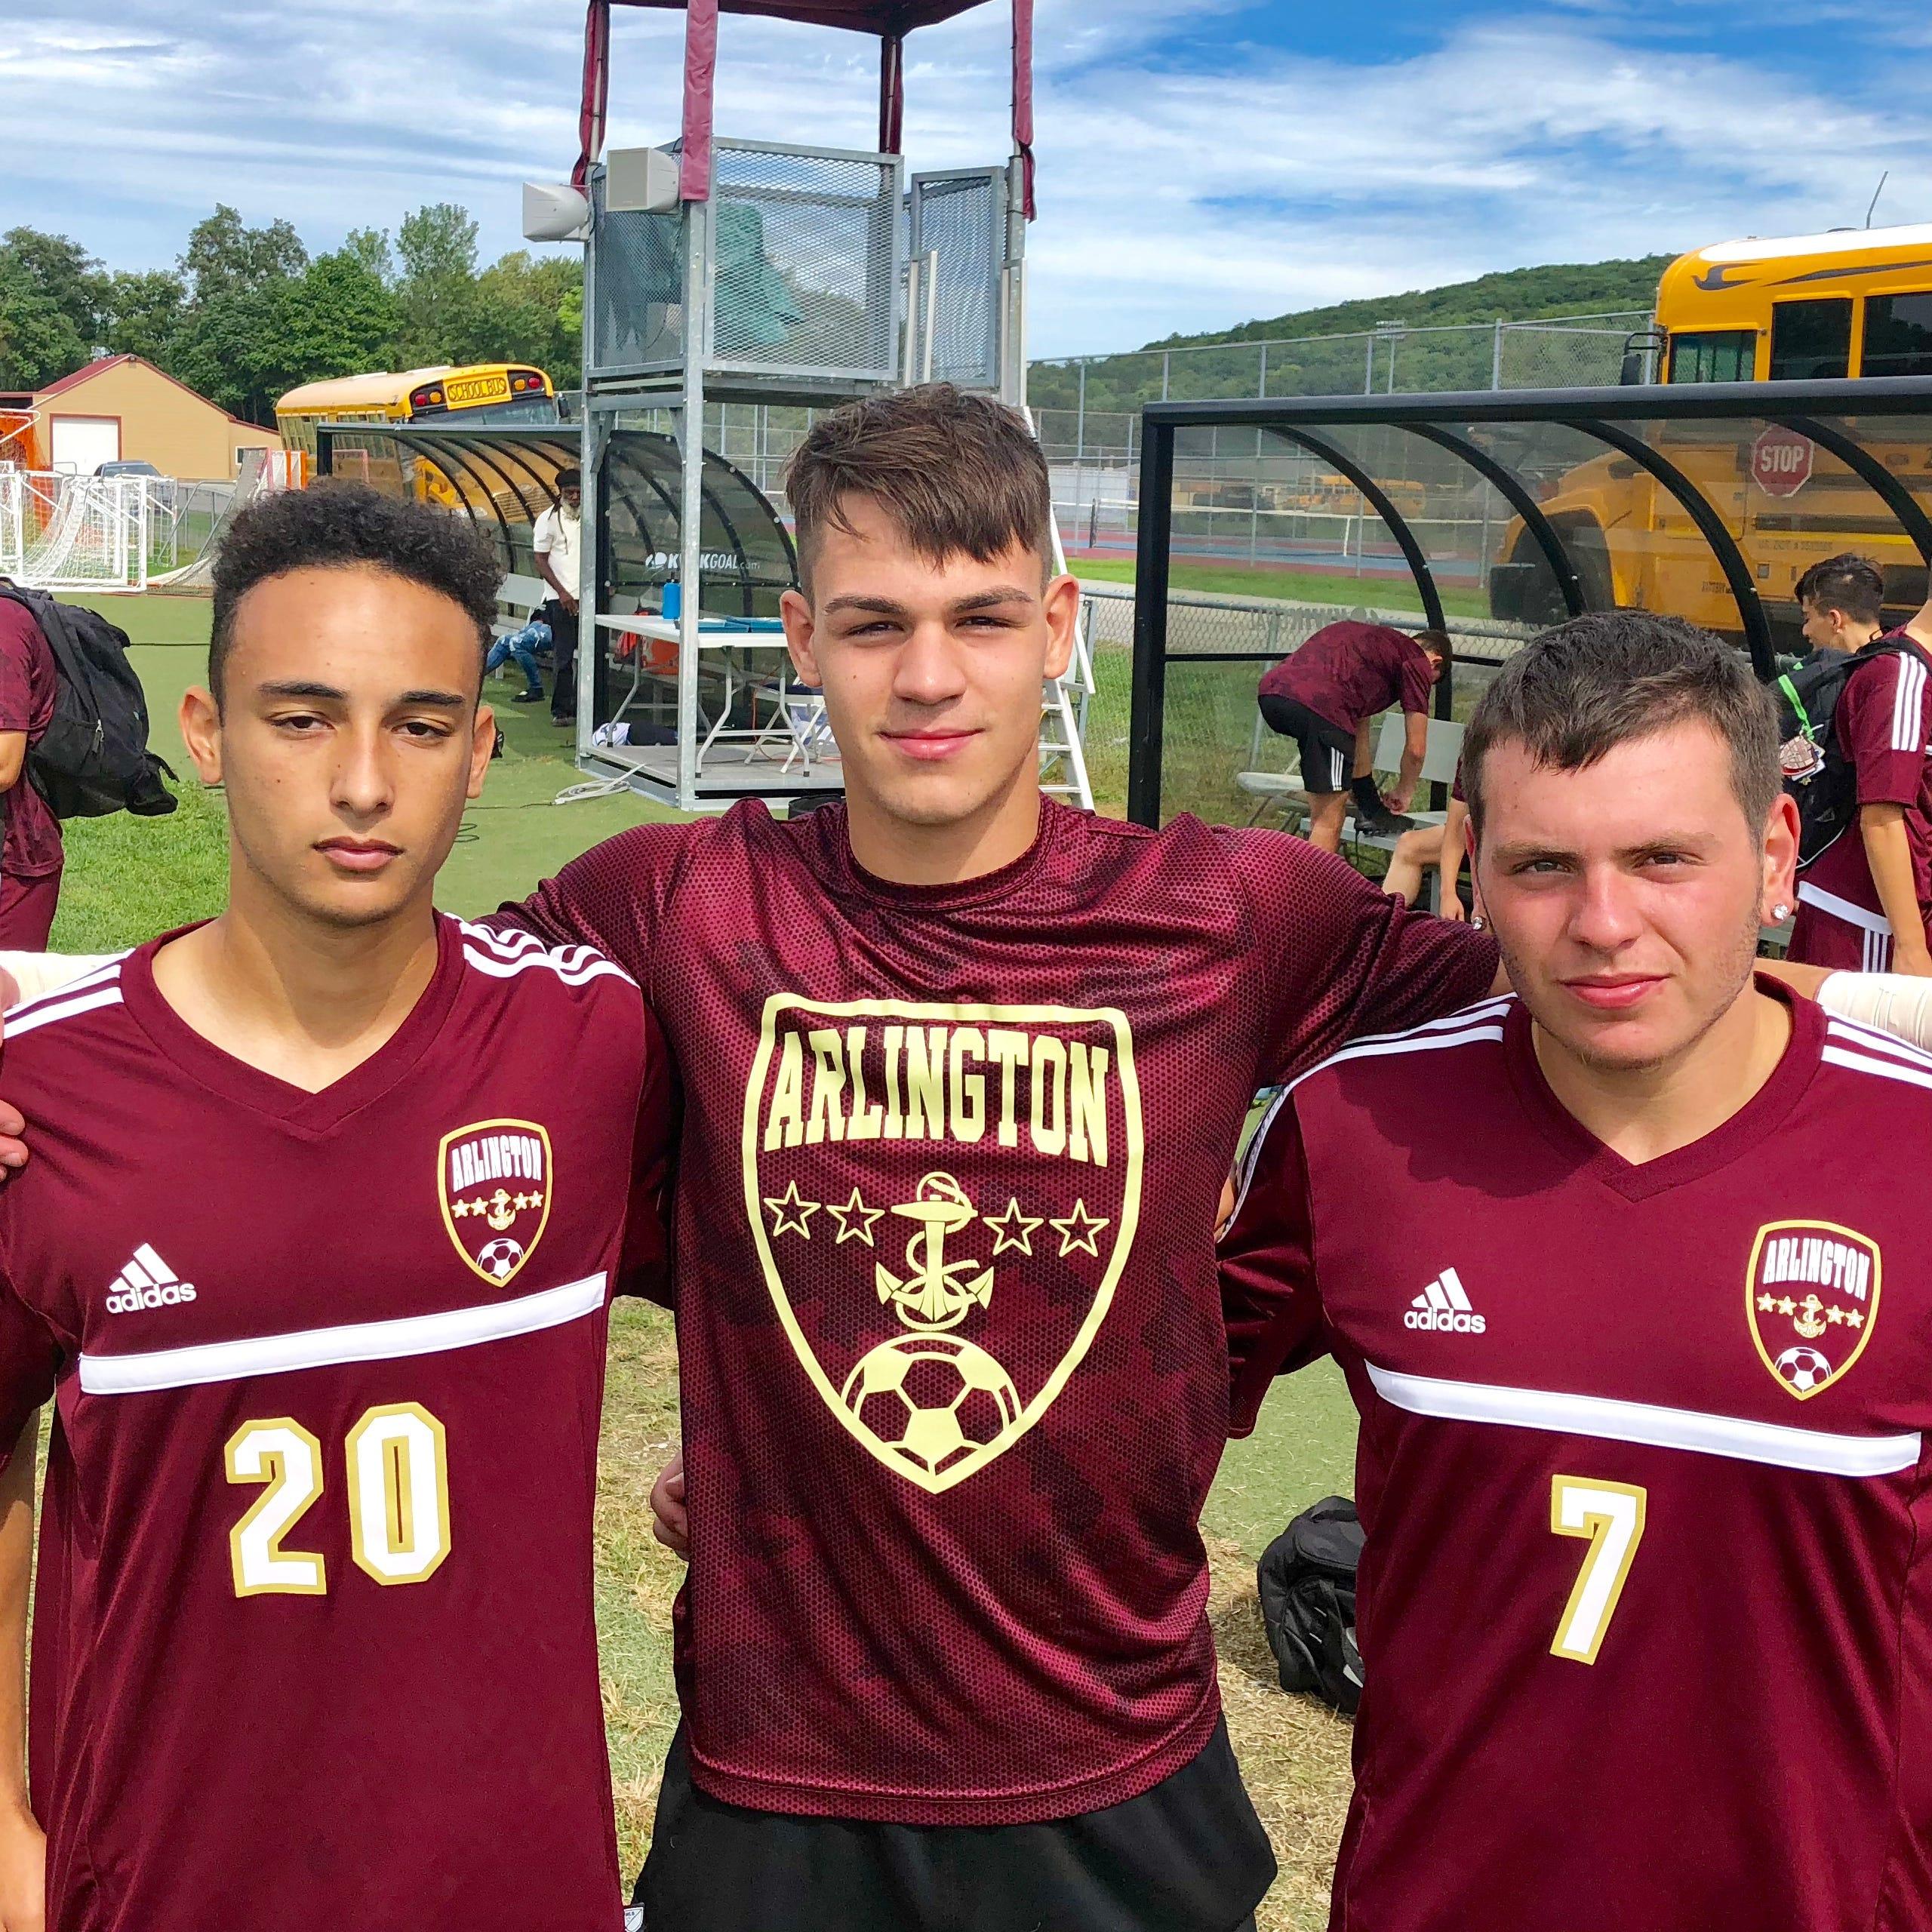 Boys soccer: Colantuono, defense power Arlington as Admirals top rival Ketcham